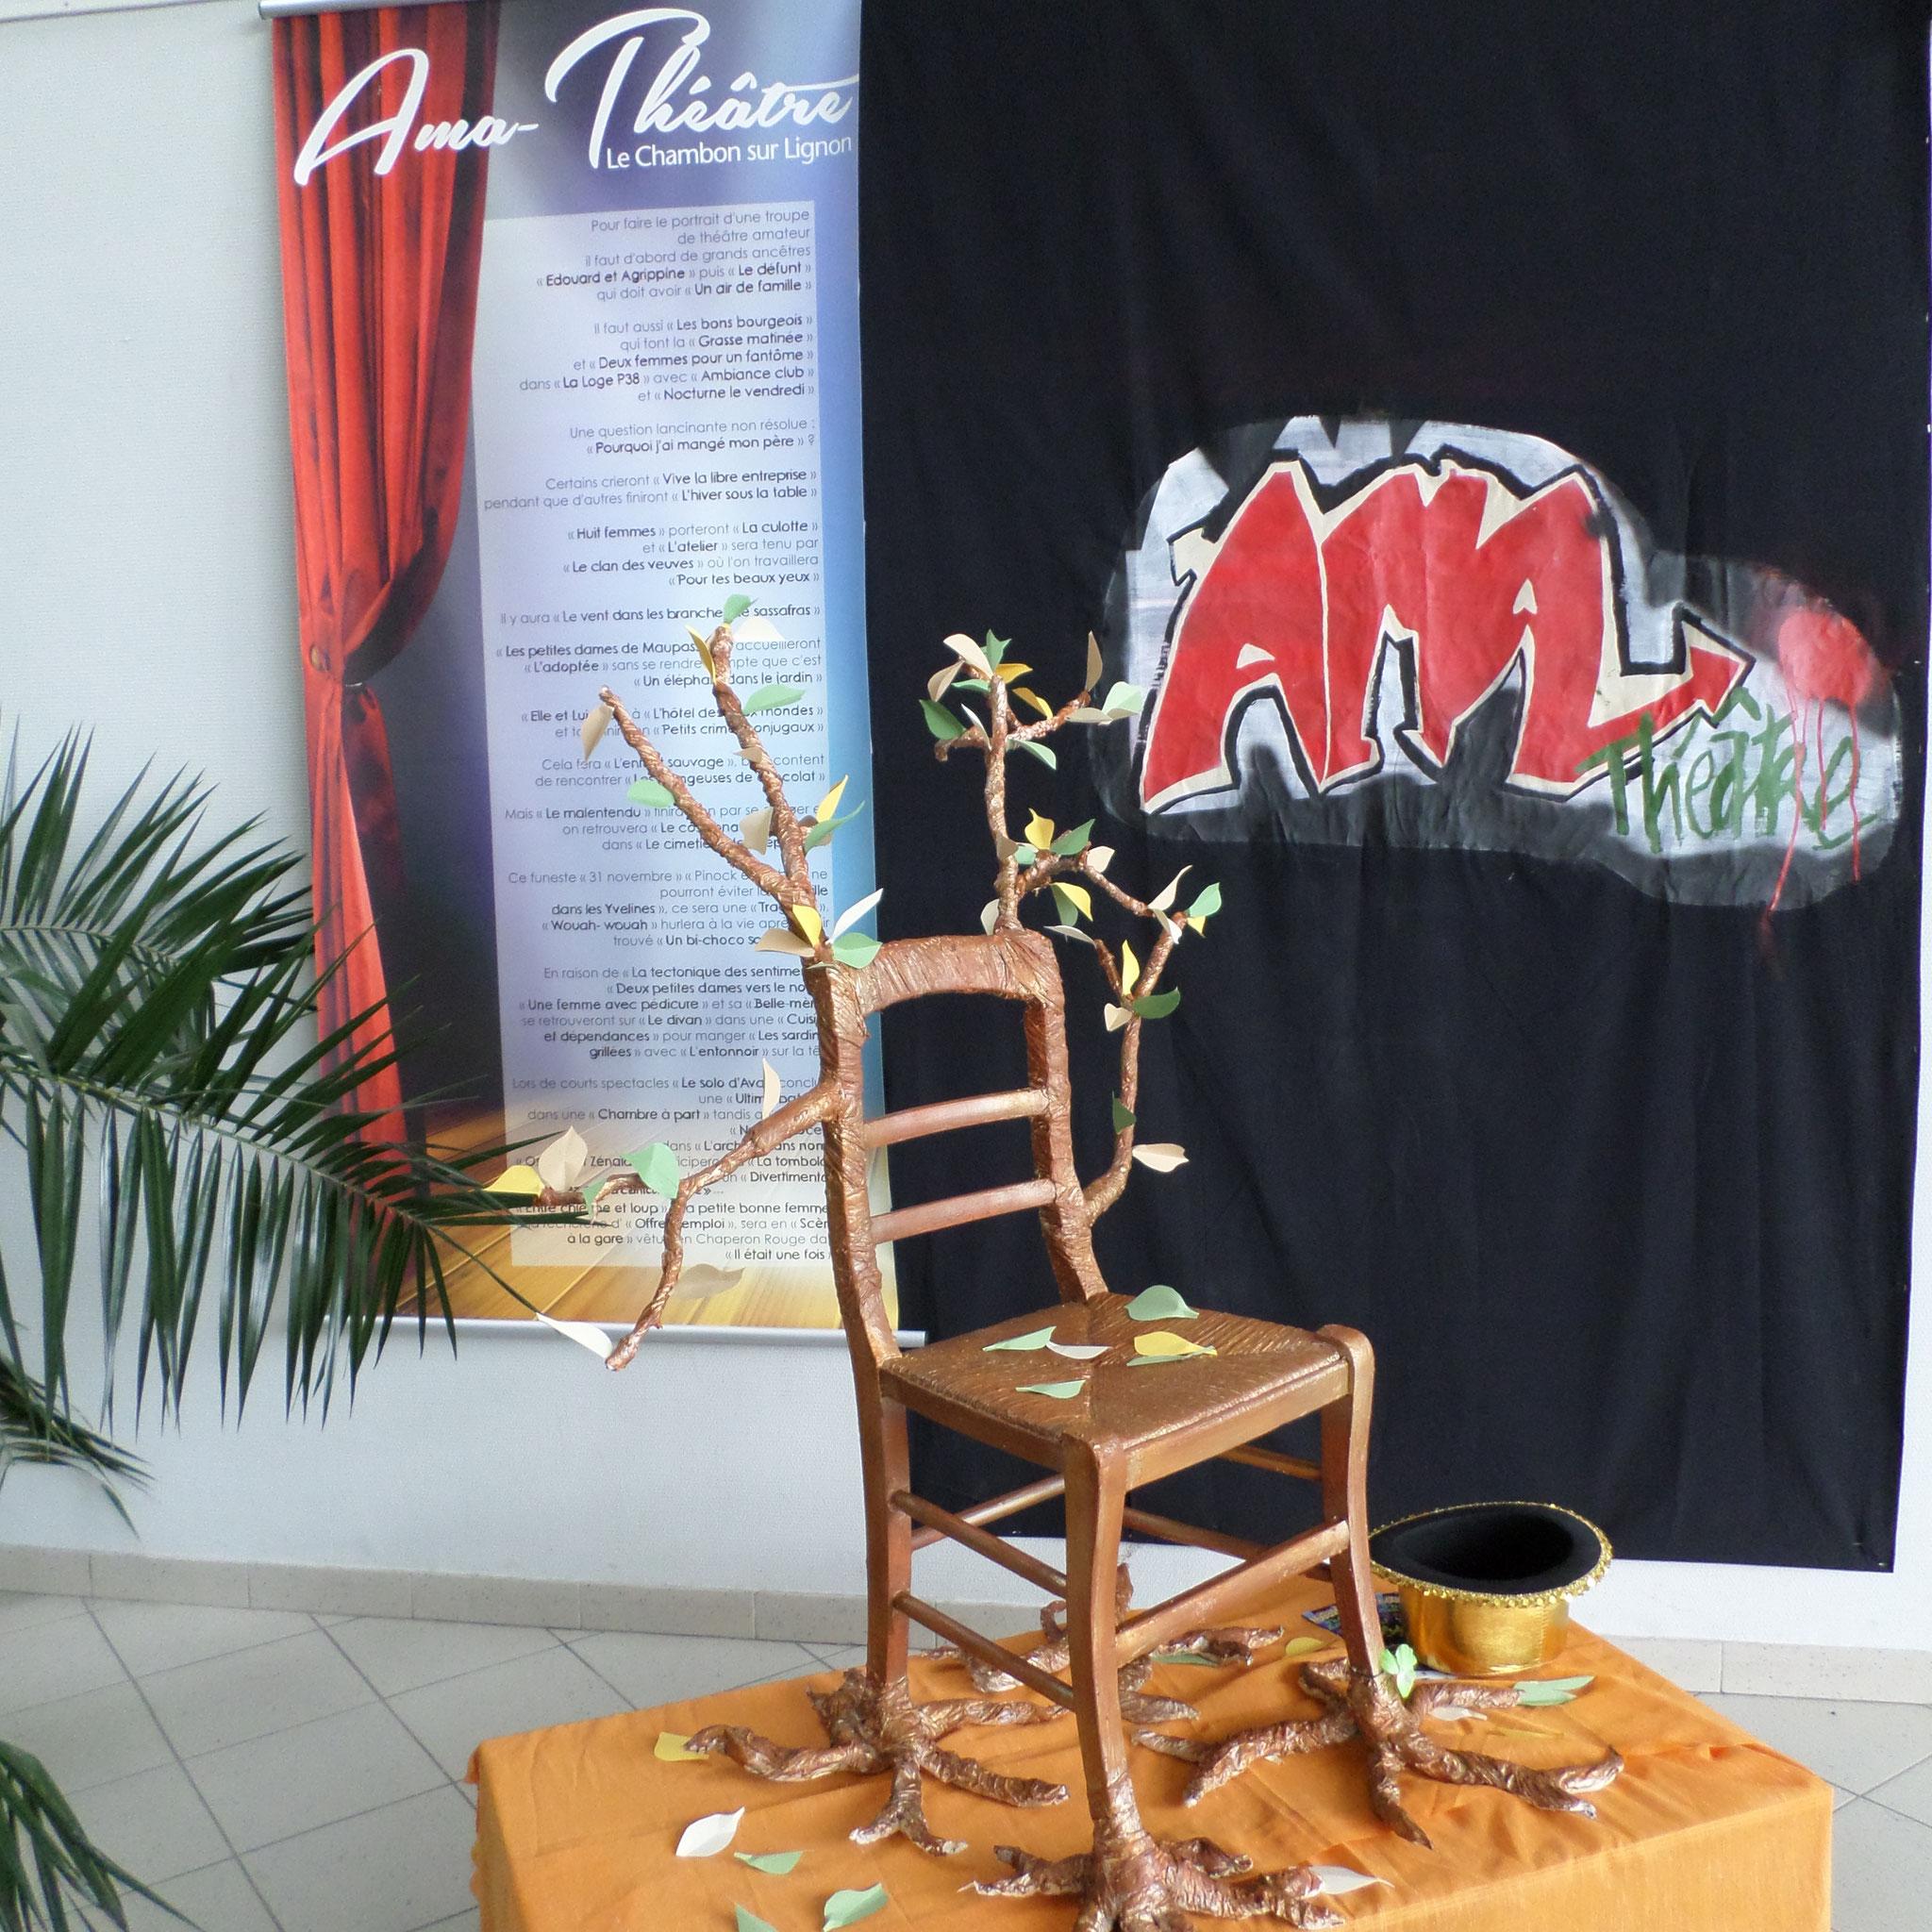 Créations: chaise/Djamila Lhote et Tag/Tini Chouvenc